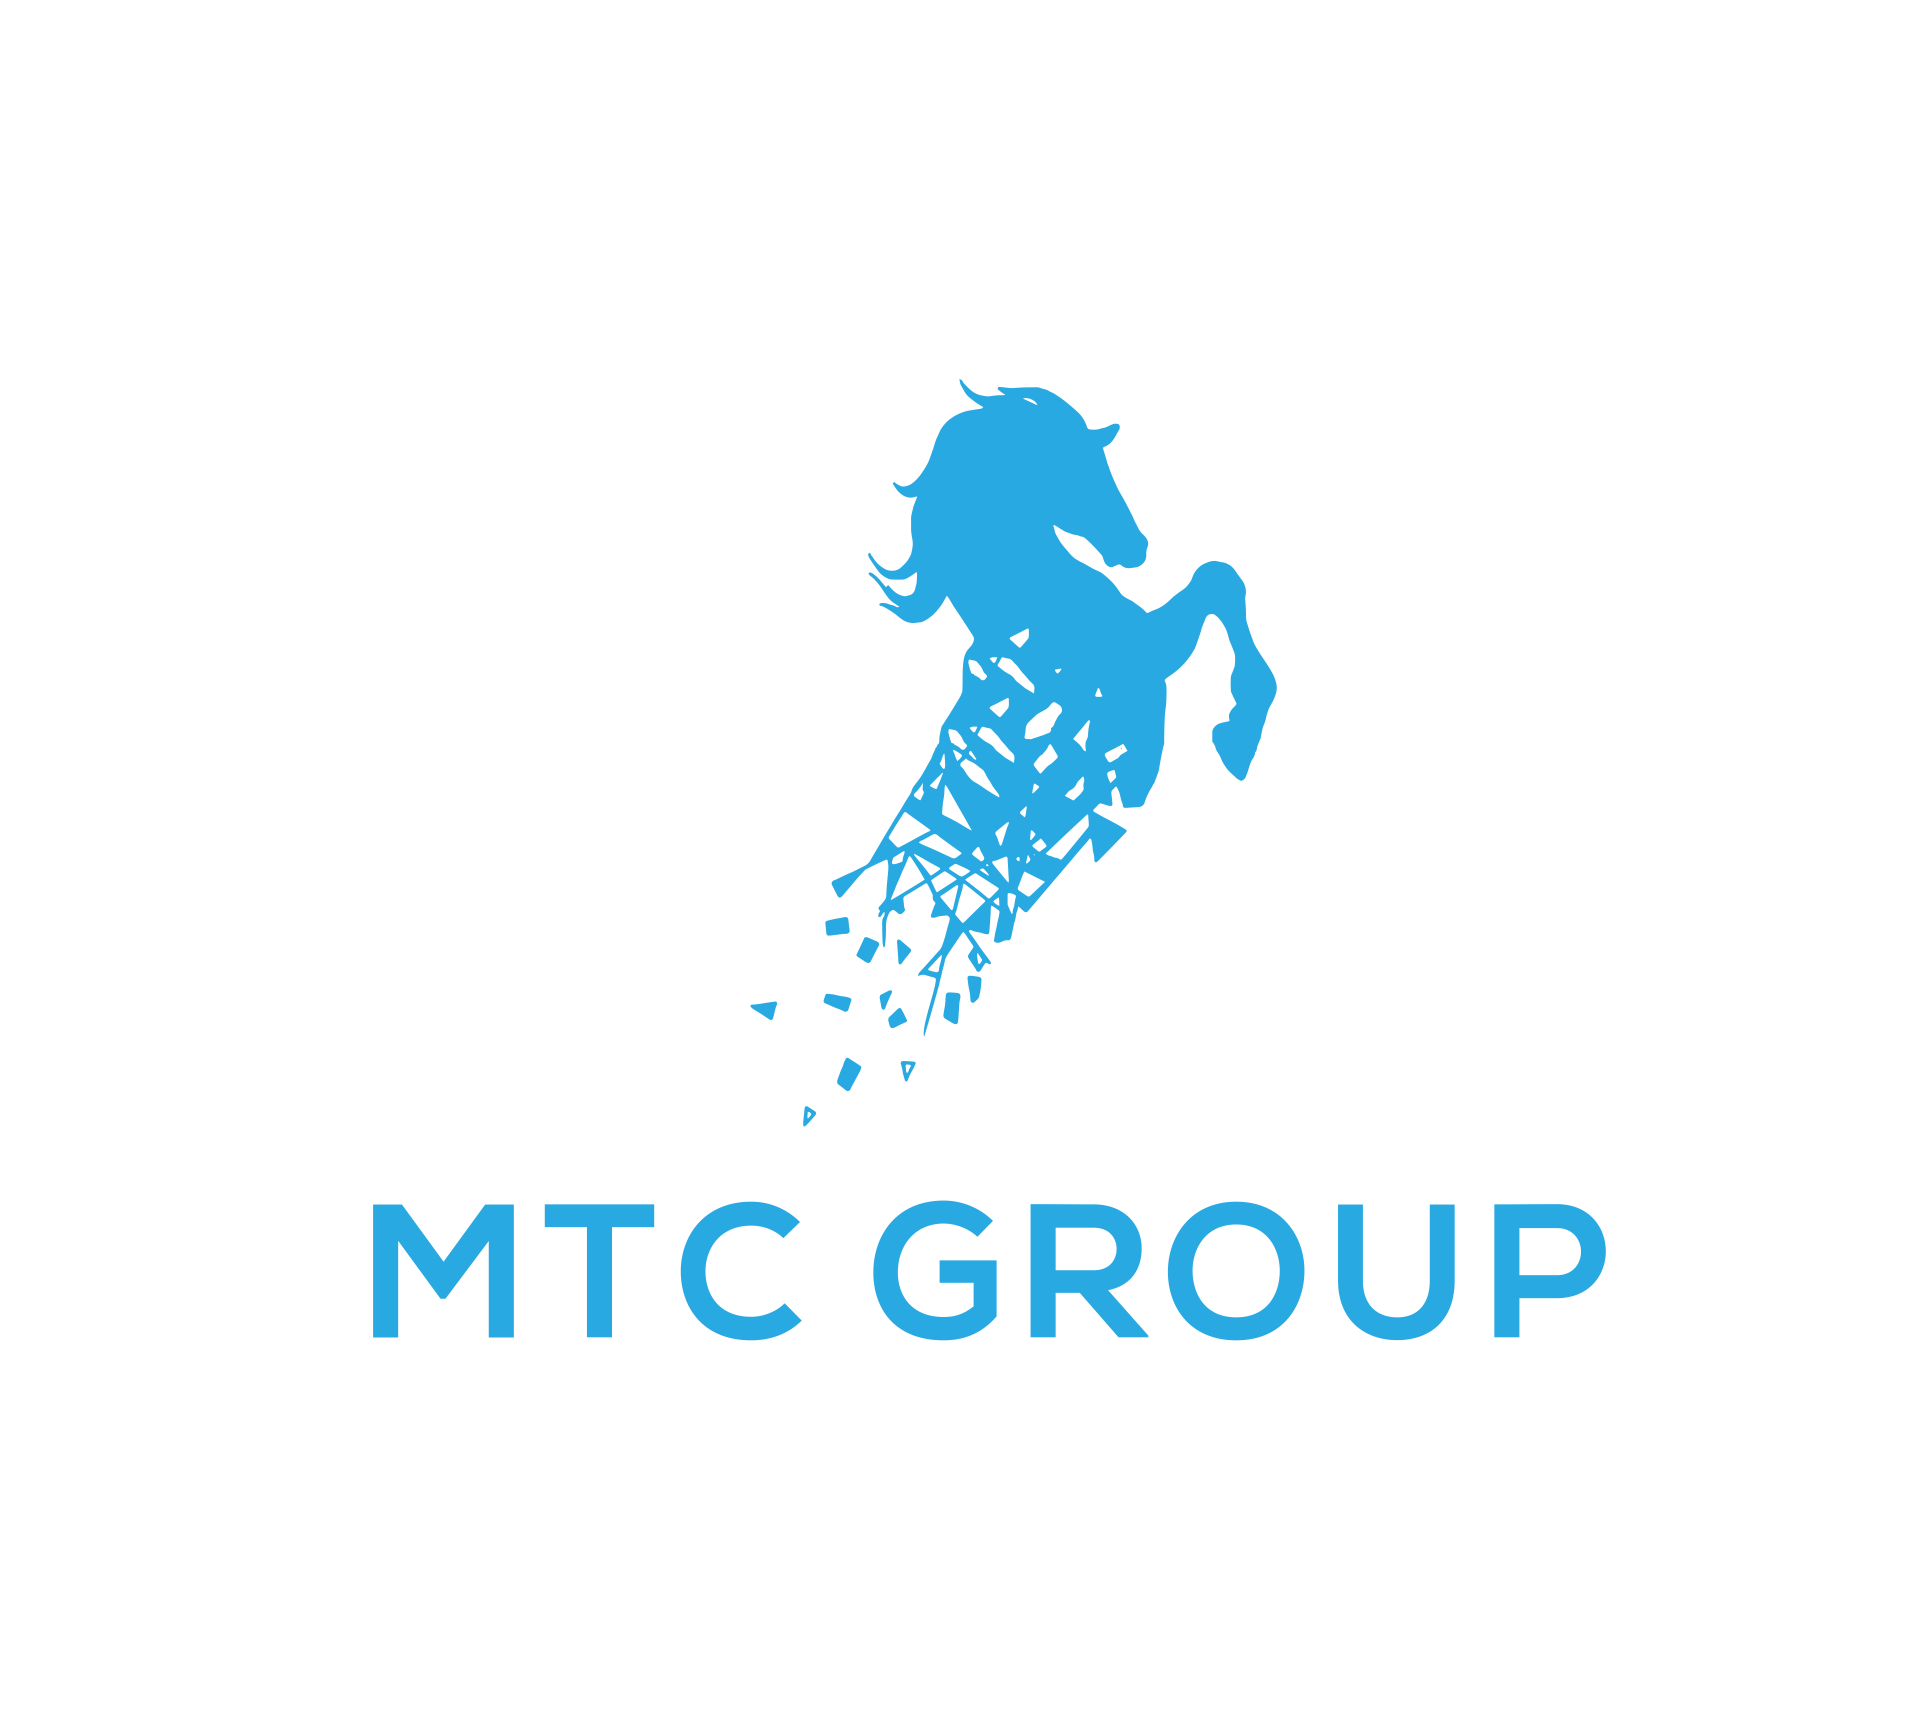 Copper Manufacturing Company – Indigo Mercure Metals – MTC Group Social Media Marketing